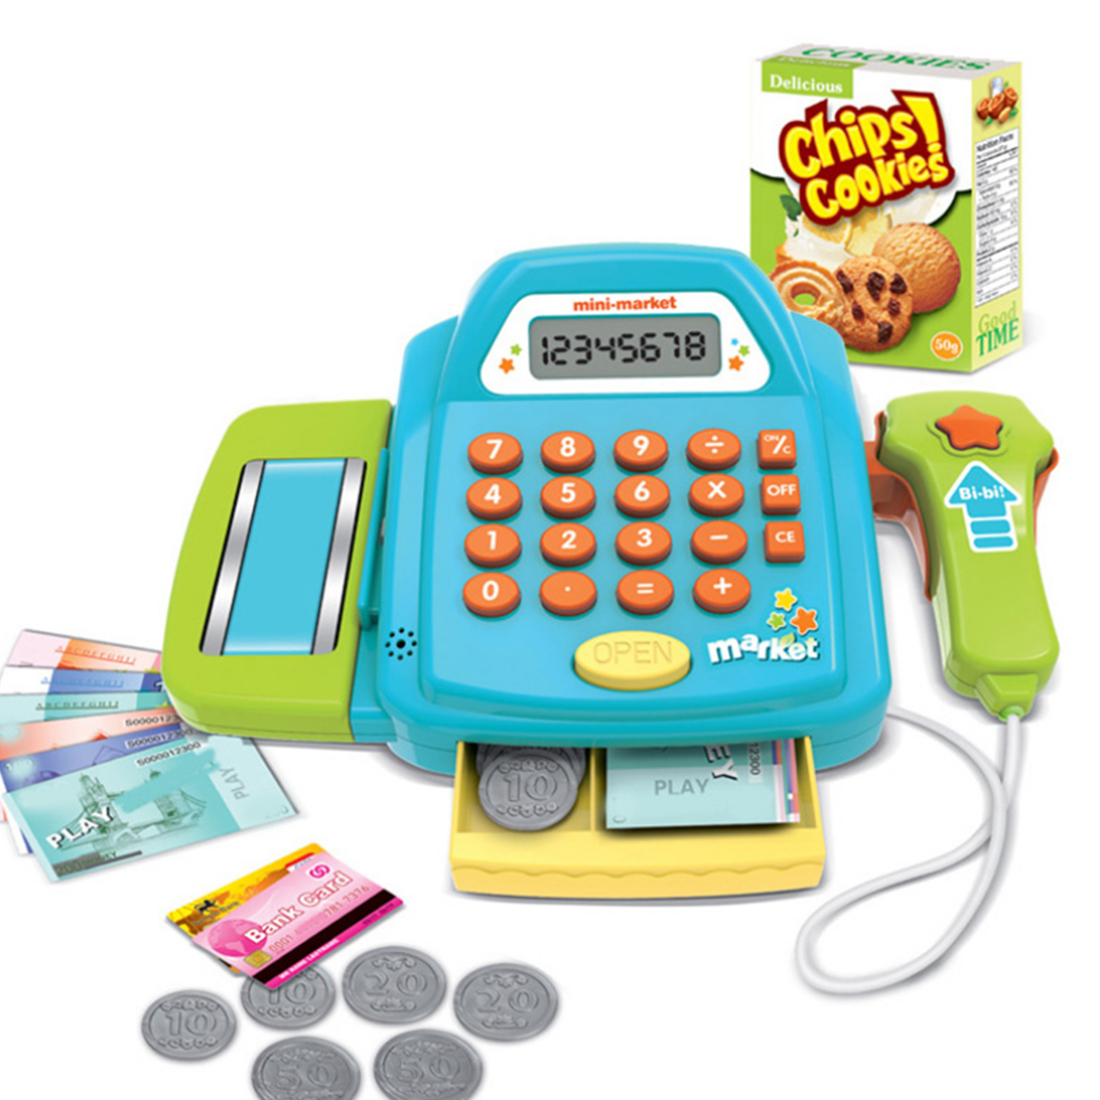 Kids Supermarket Cash Register Electronic Toys with Foods Money Children Learning Education Pretend Play Set Best Christmas Gift Karachi